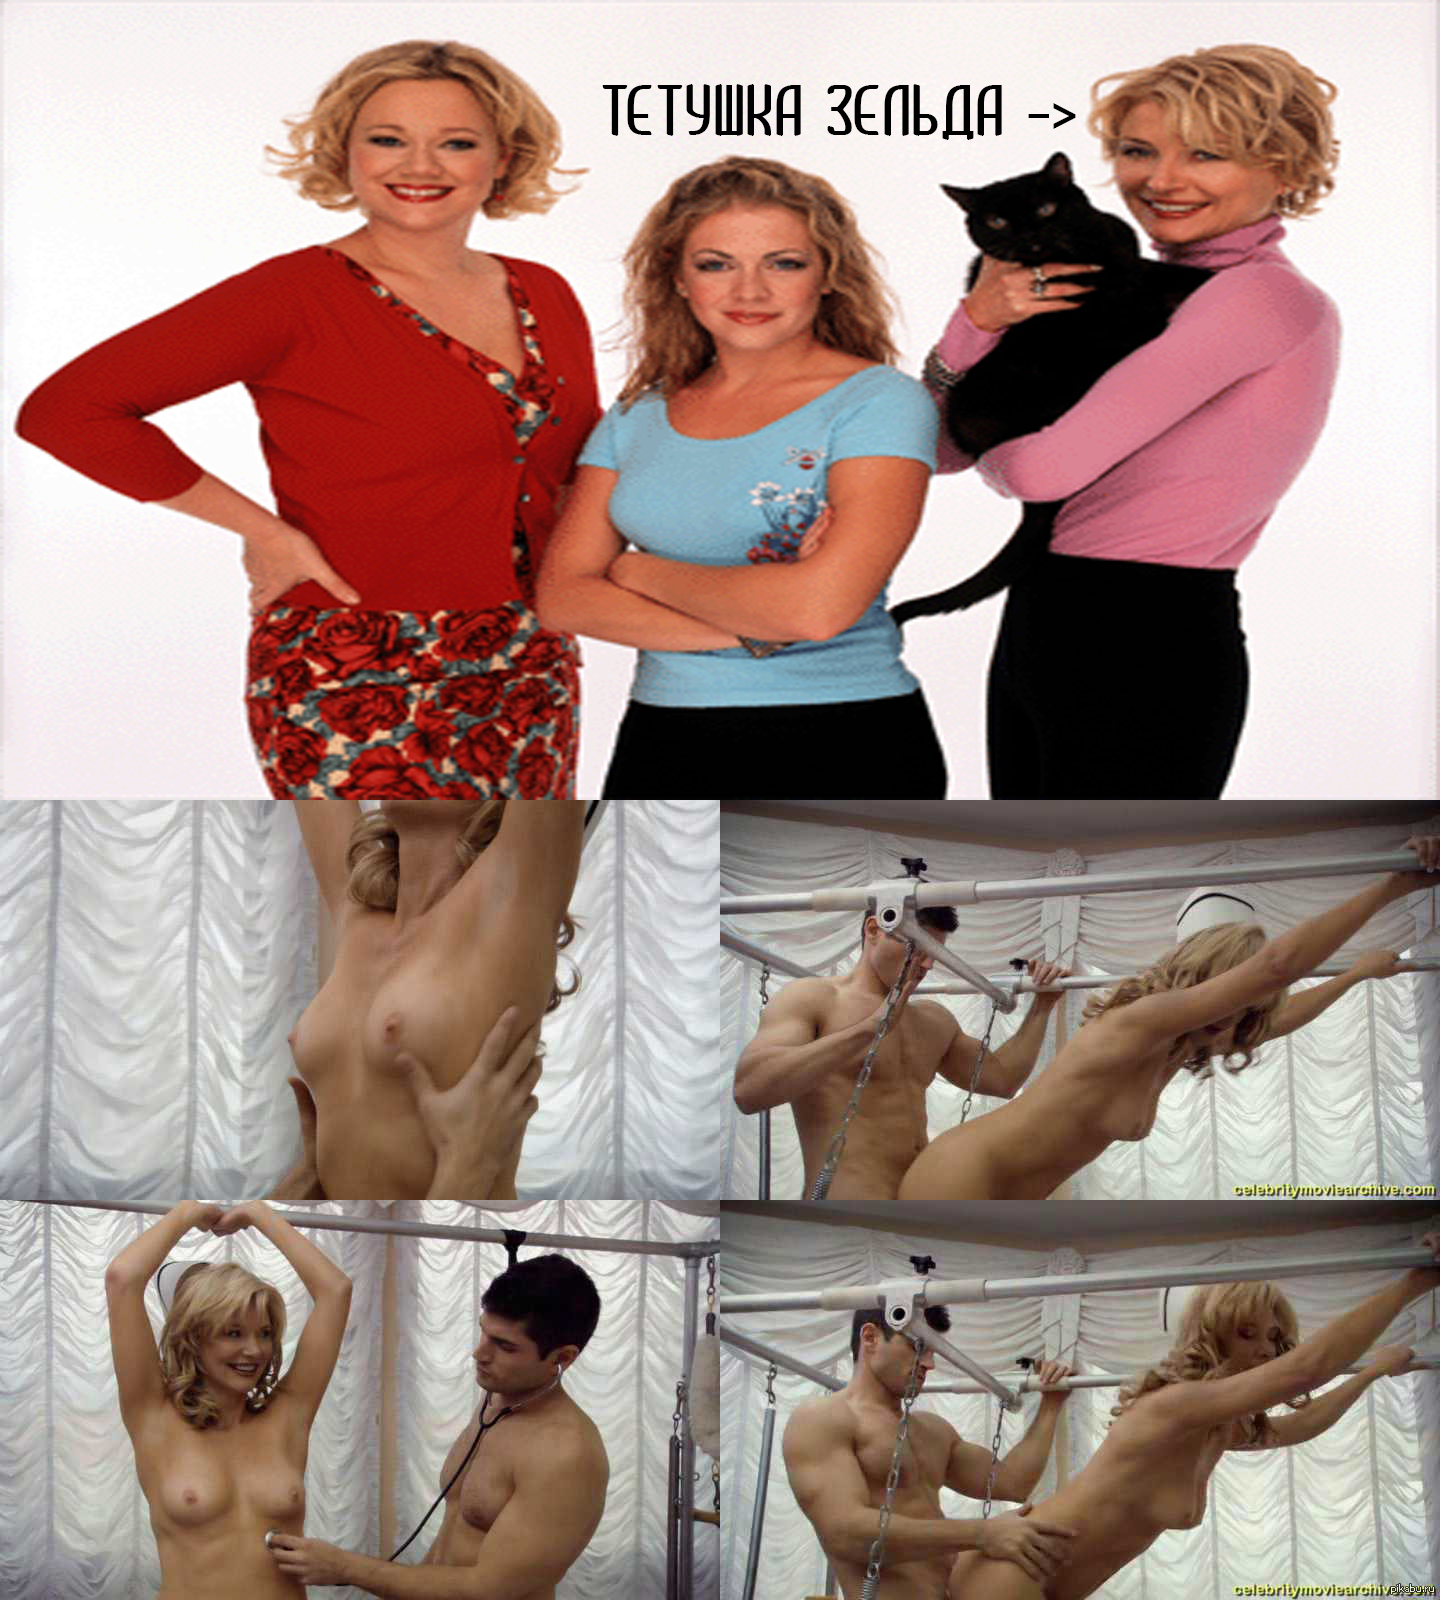 beth-broderick-nude-video